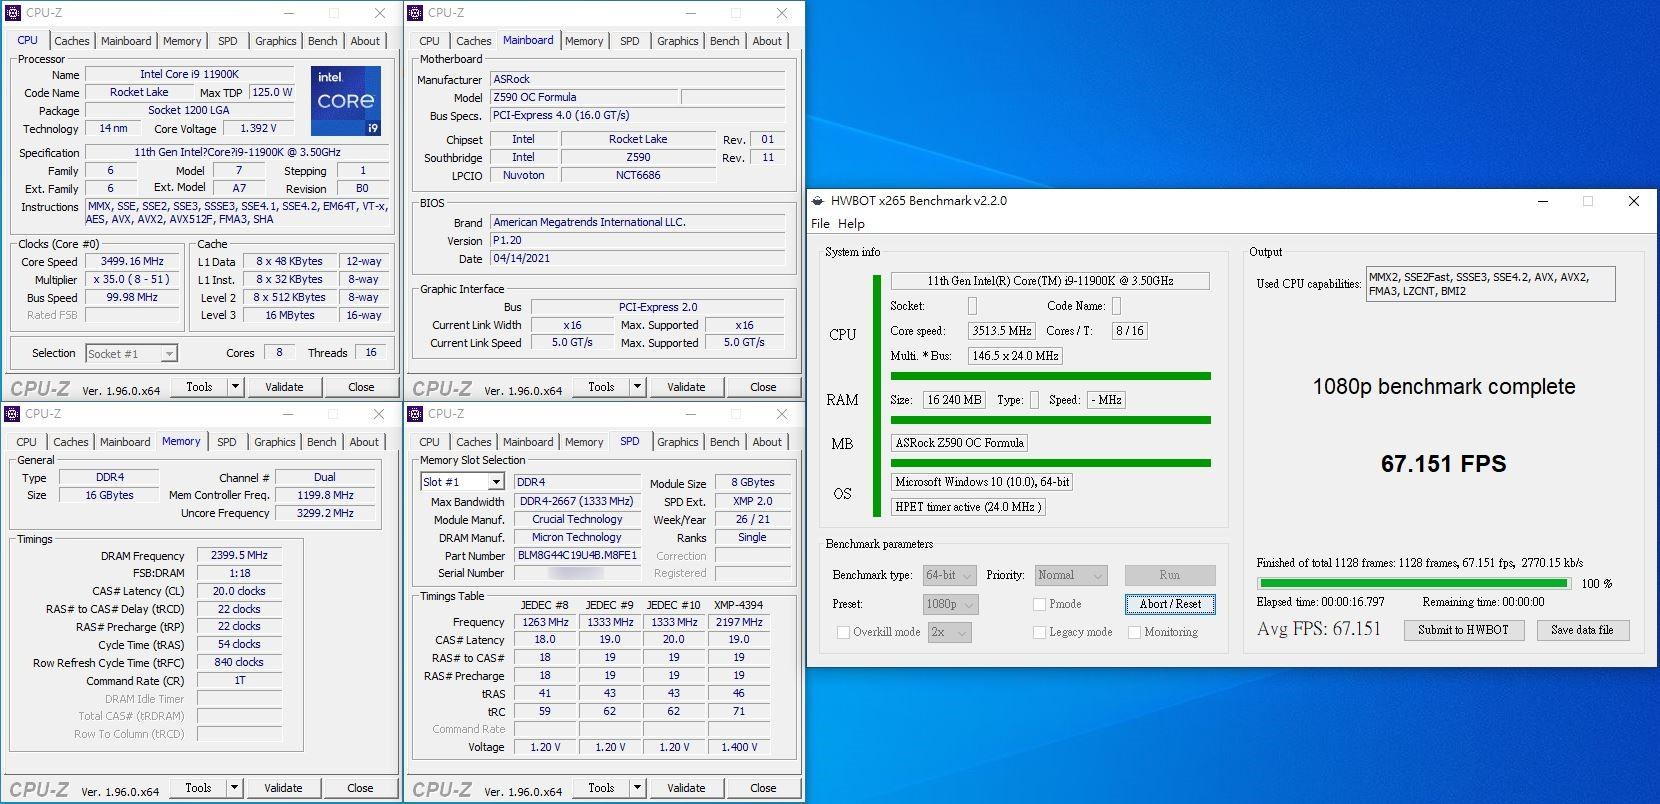 Crucial Ballistix MAX DDR4-4400電競記憶體-輕鬆獲得高頻率效能...5394